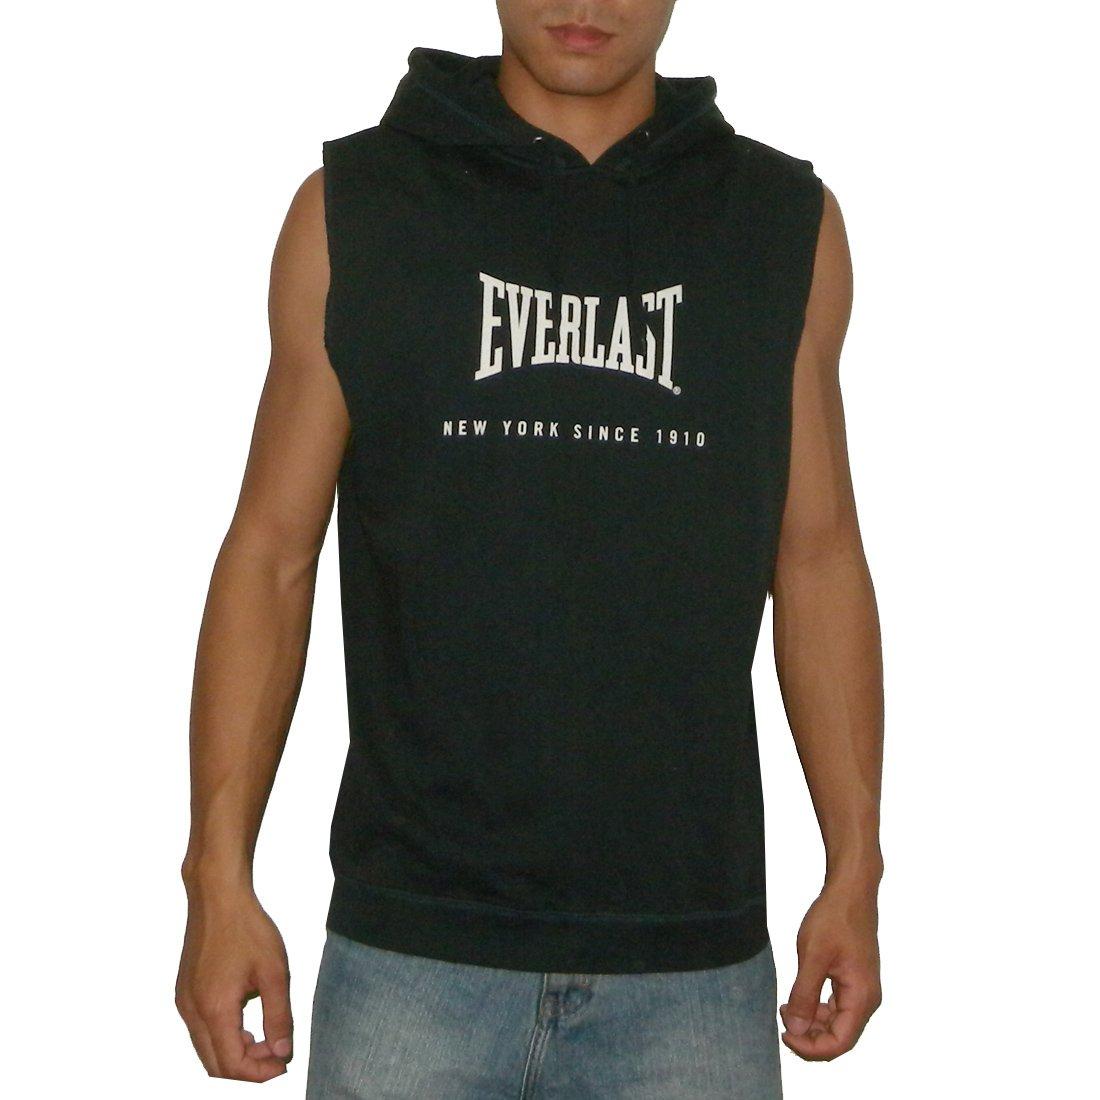 d7f7dcbf33cae EVERLAST Mens Athletic Sleeveless Pullover Hoodie Sweatshirt   Vest - Dark  Blue (Size  2XL) at Amazon Men s Clothing store  Sweater Vests